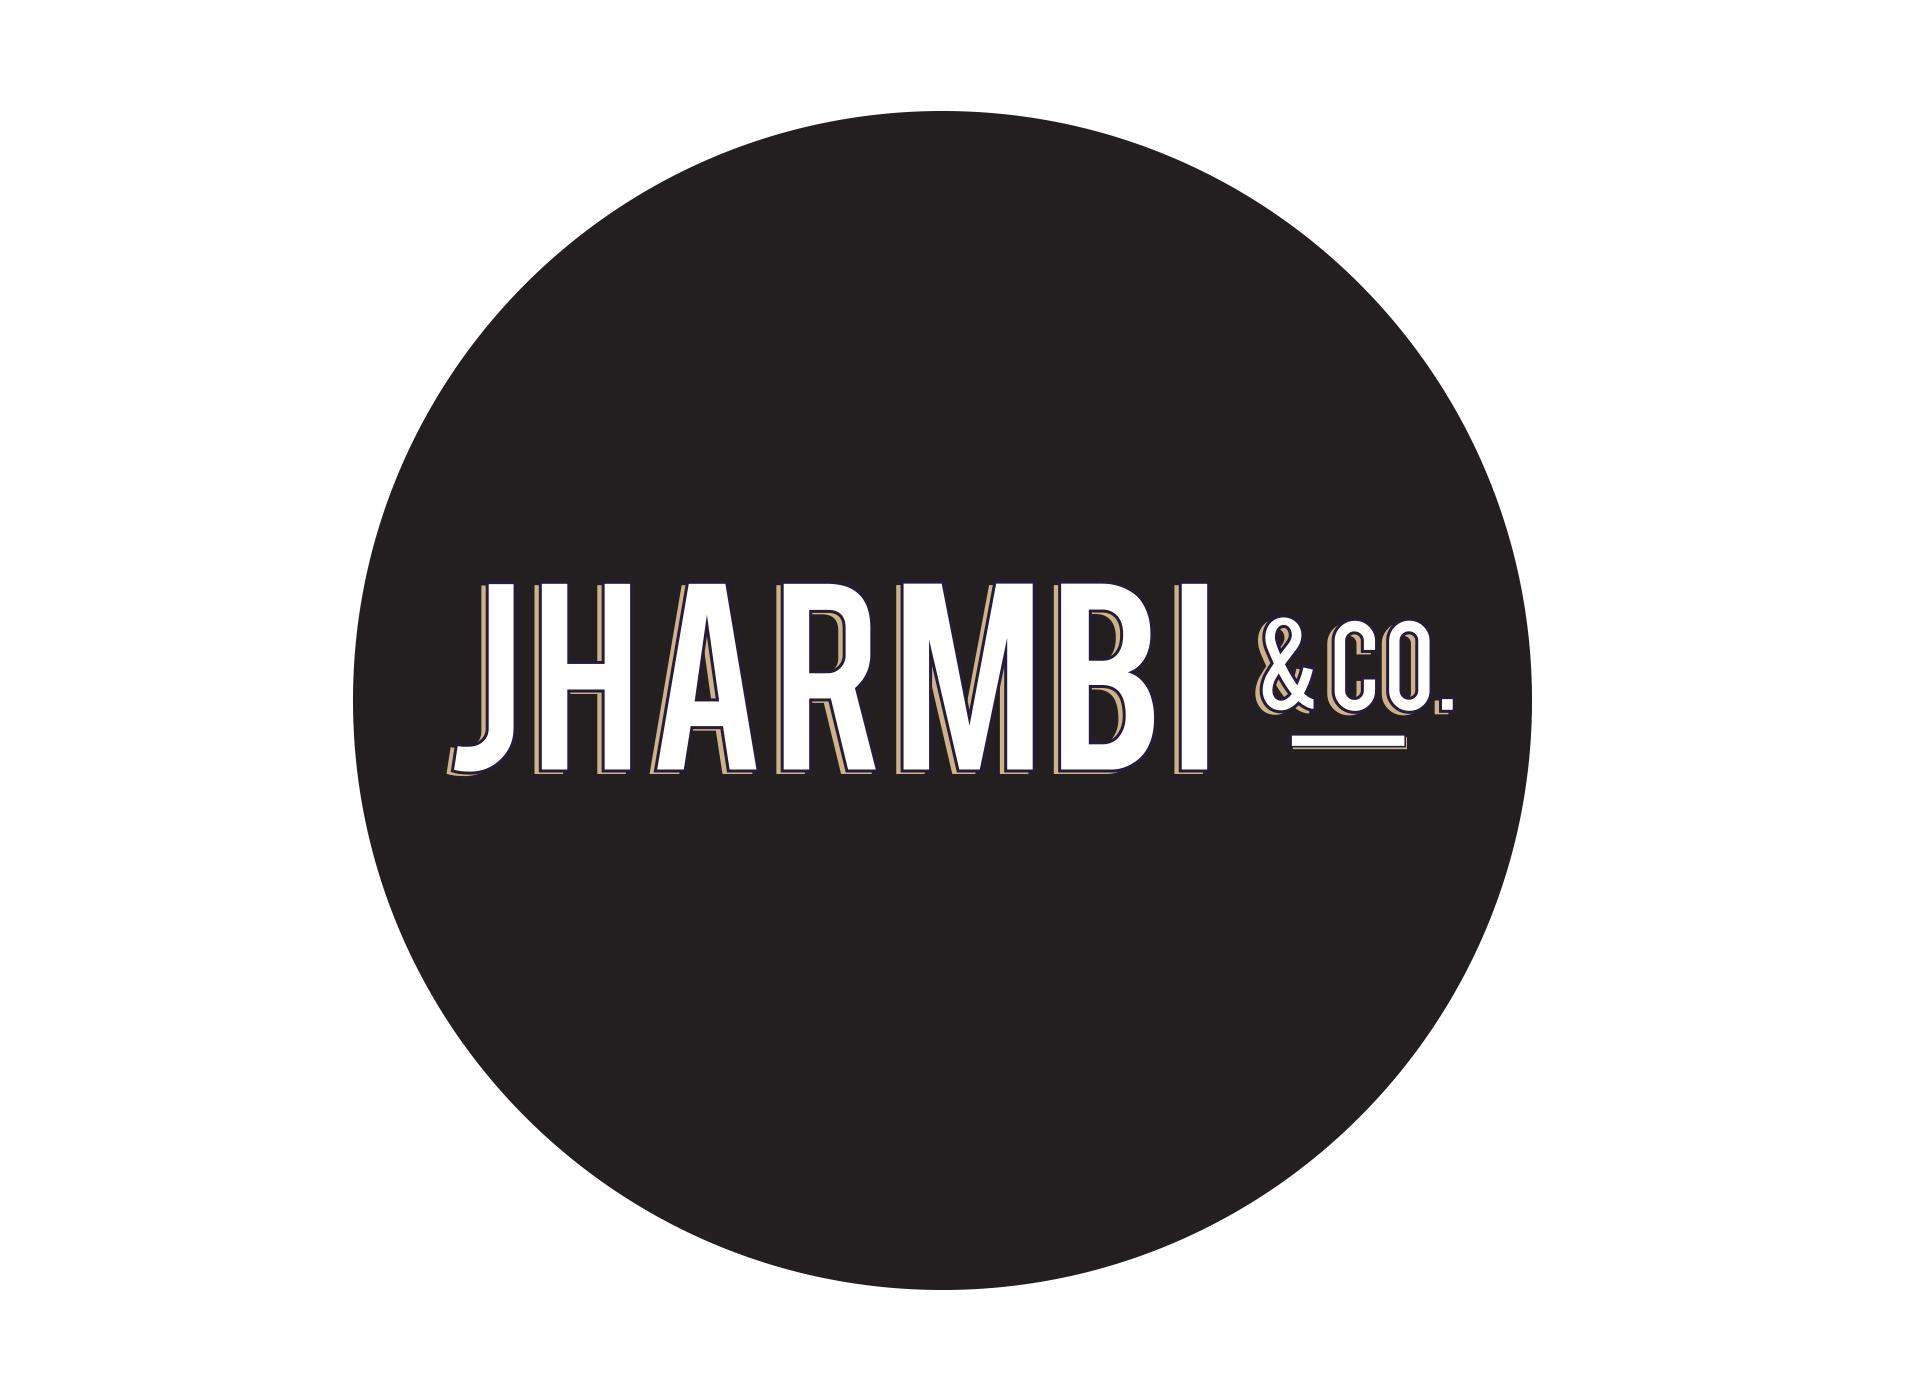 Jharmbi-&-Co.-Branding-by-Miriam-McWillaim-Studio Mimi Moon-4